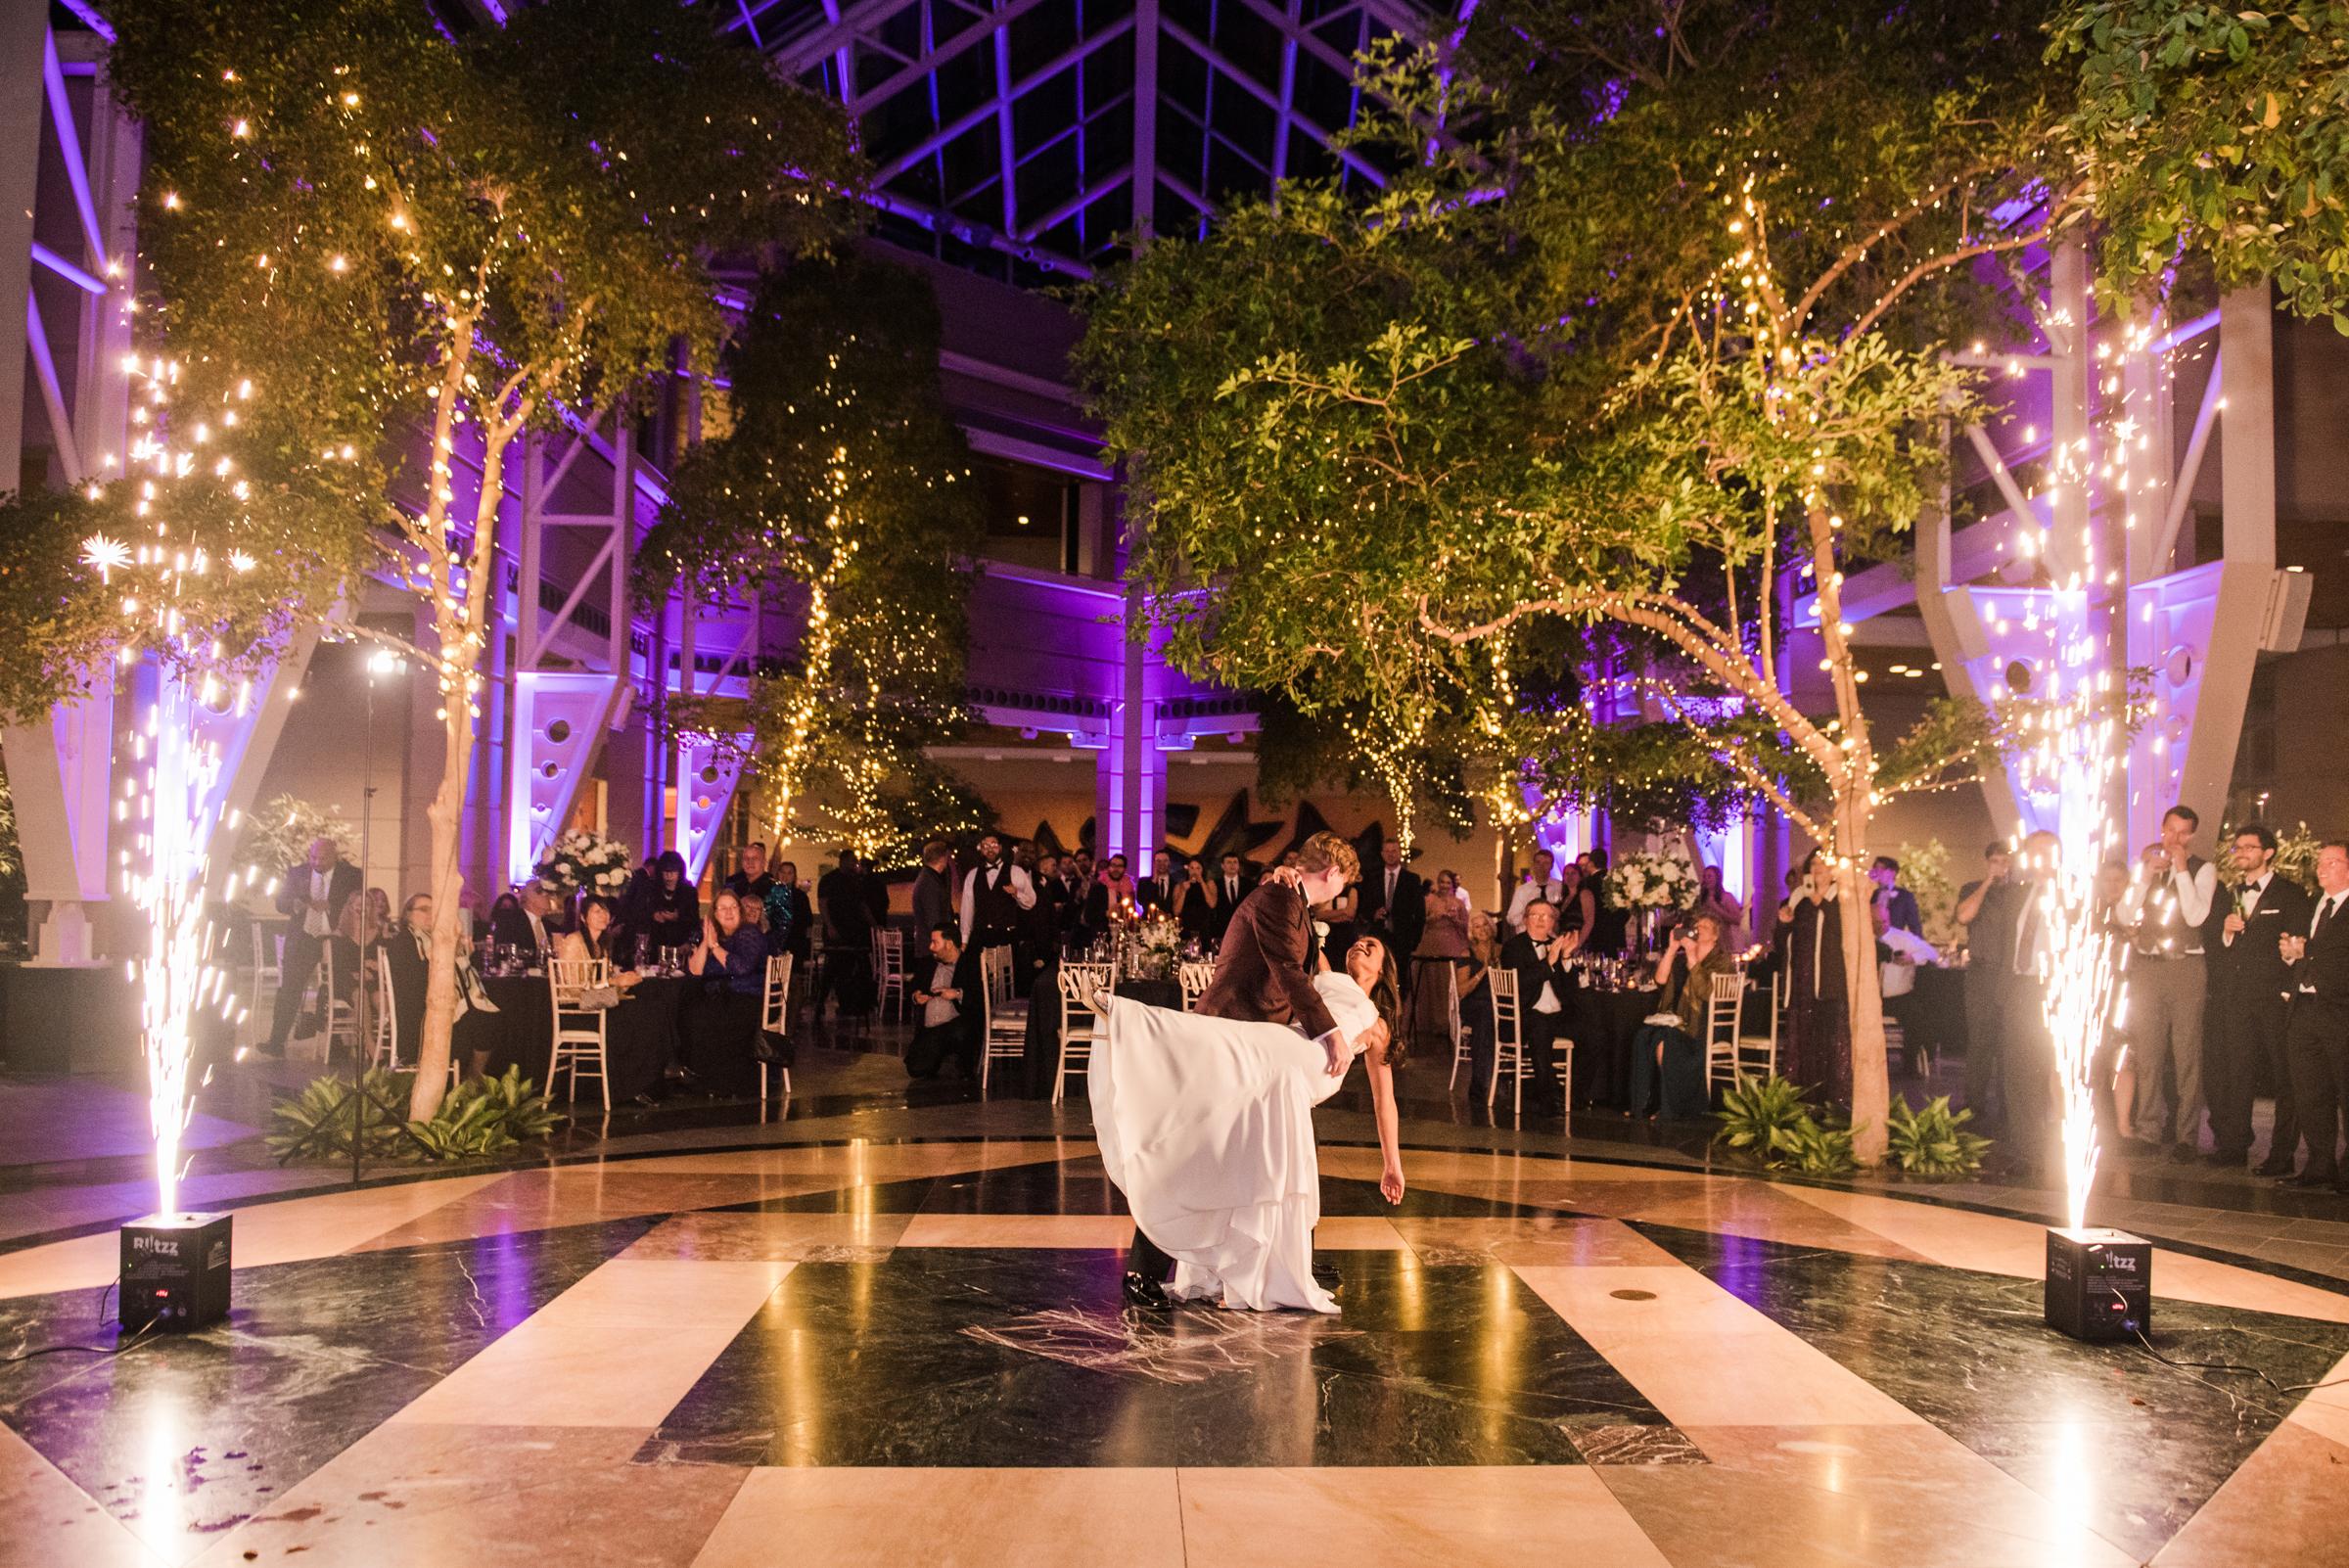 Wintergarden_by_Monroes_Rochester_Wedding_JILL_STUDIO_Rochester_NY_Photographer_214610.jpg